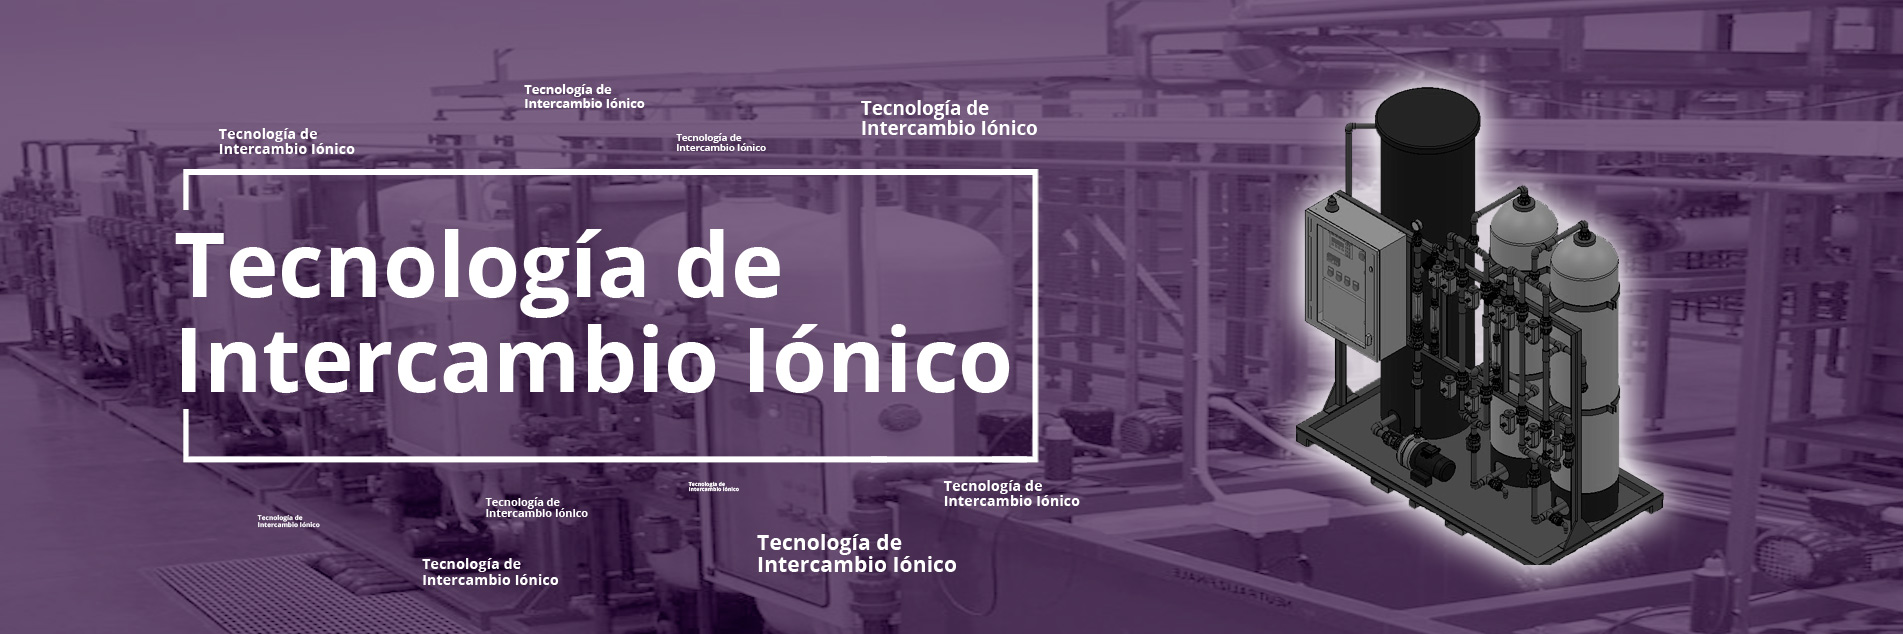 Tecnologia-de-Intercambio-Ionico